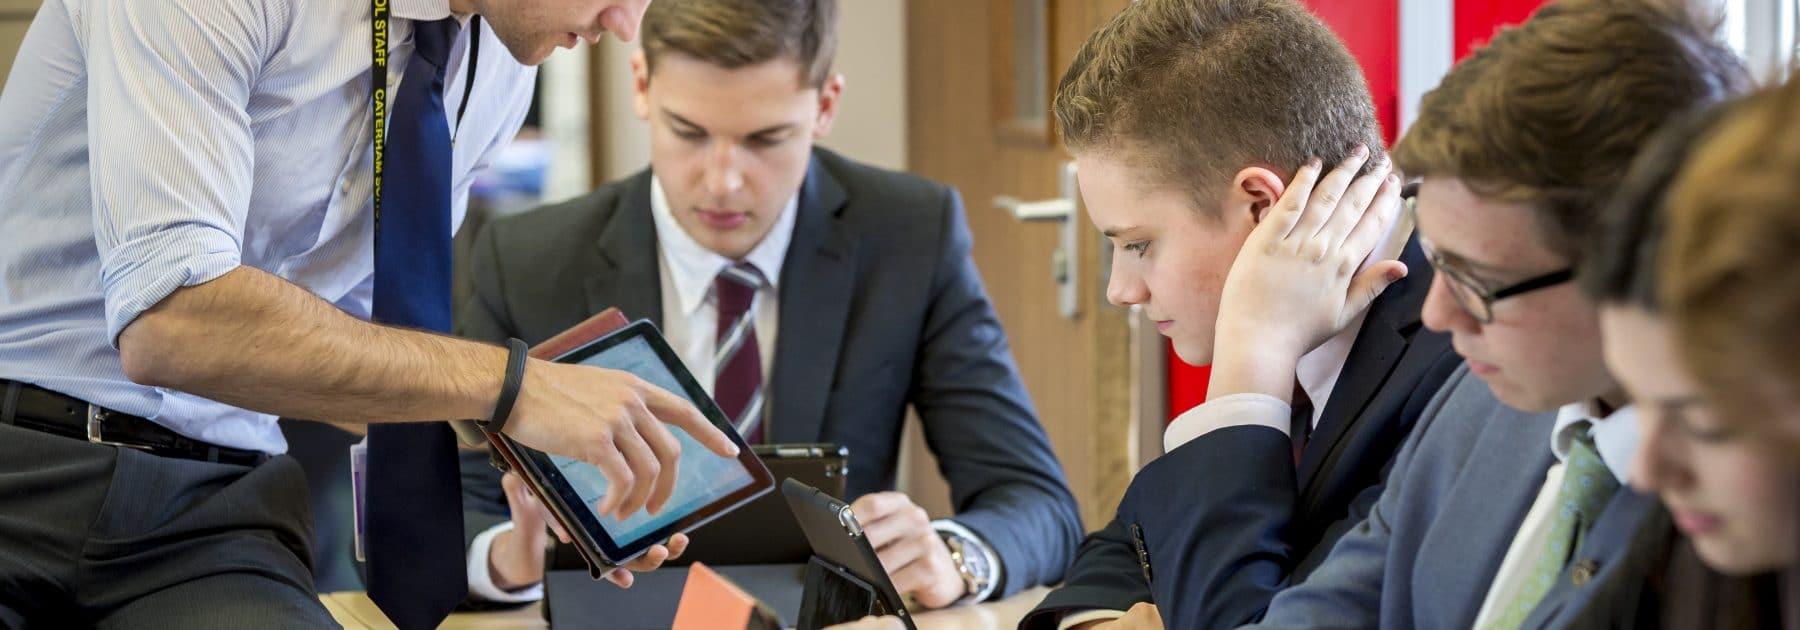 Apple Distinguished School 2021